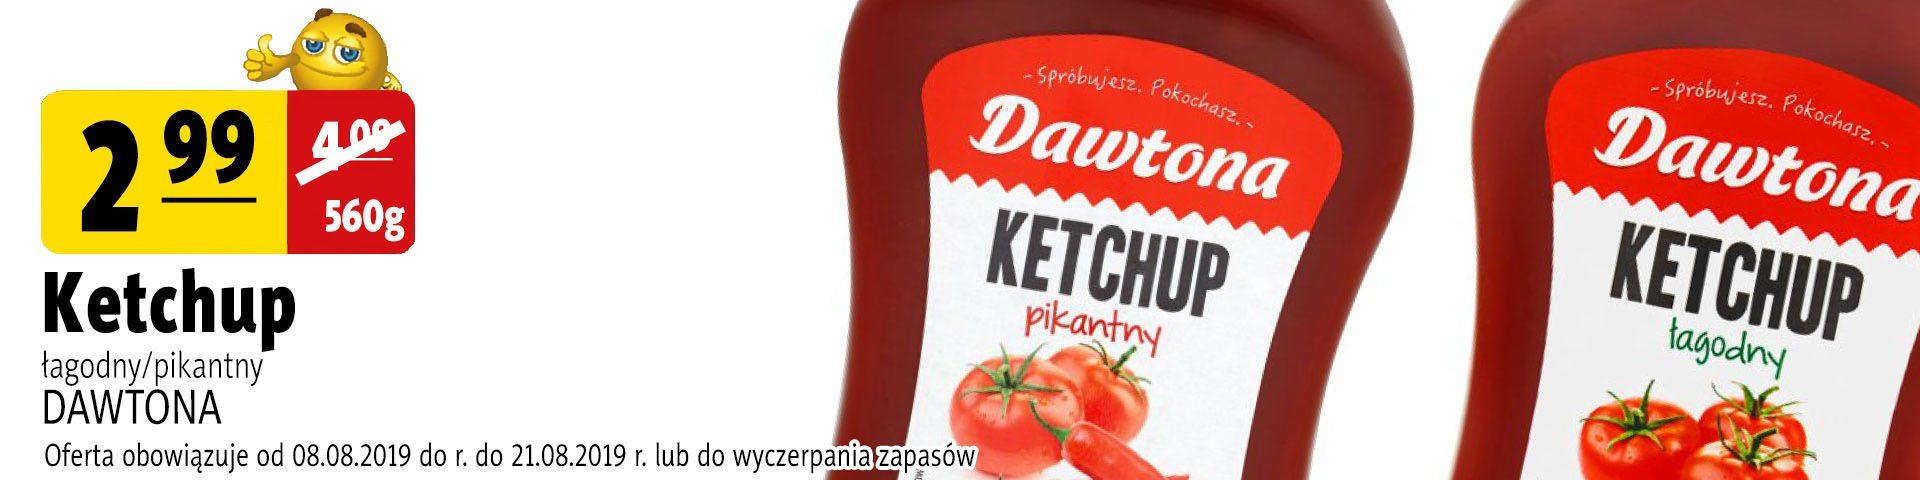 billboard_8-21.08_ketchup_dawtona v2